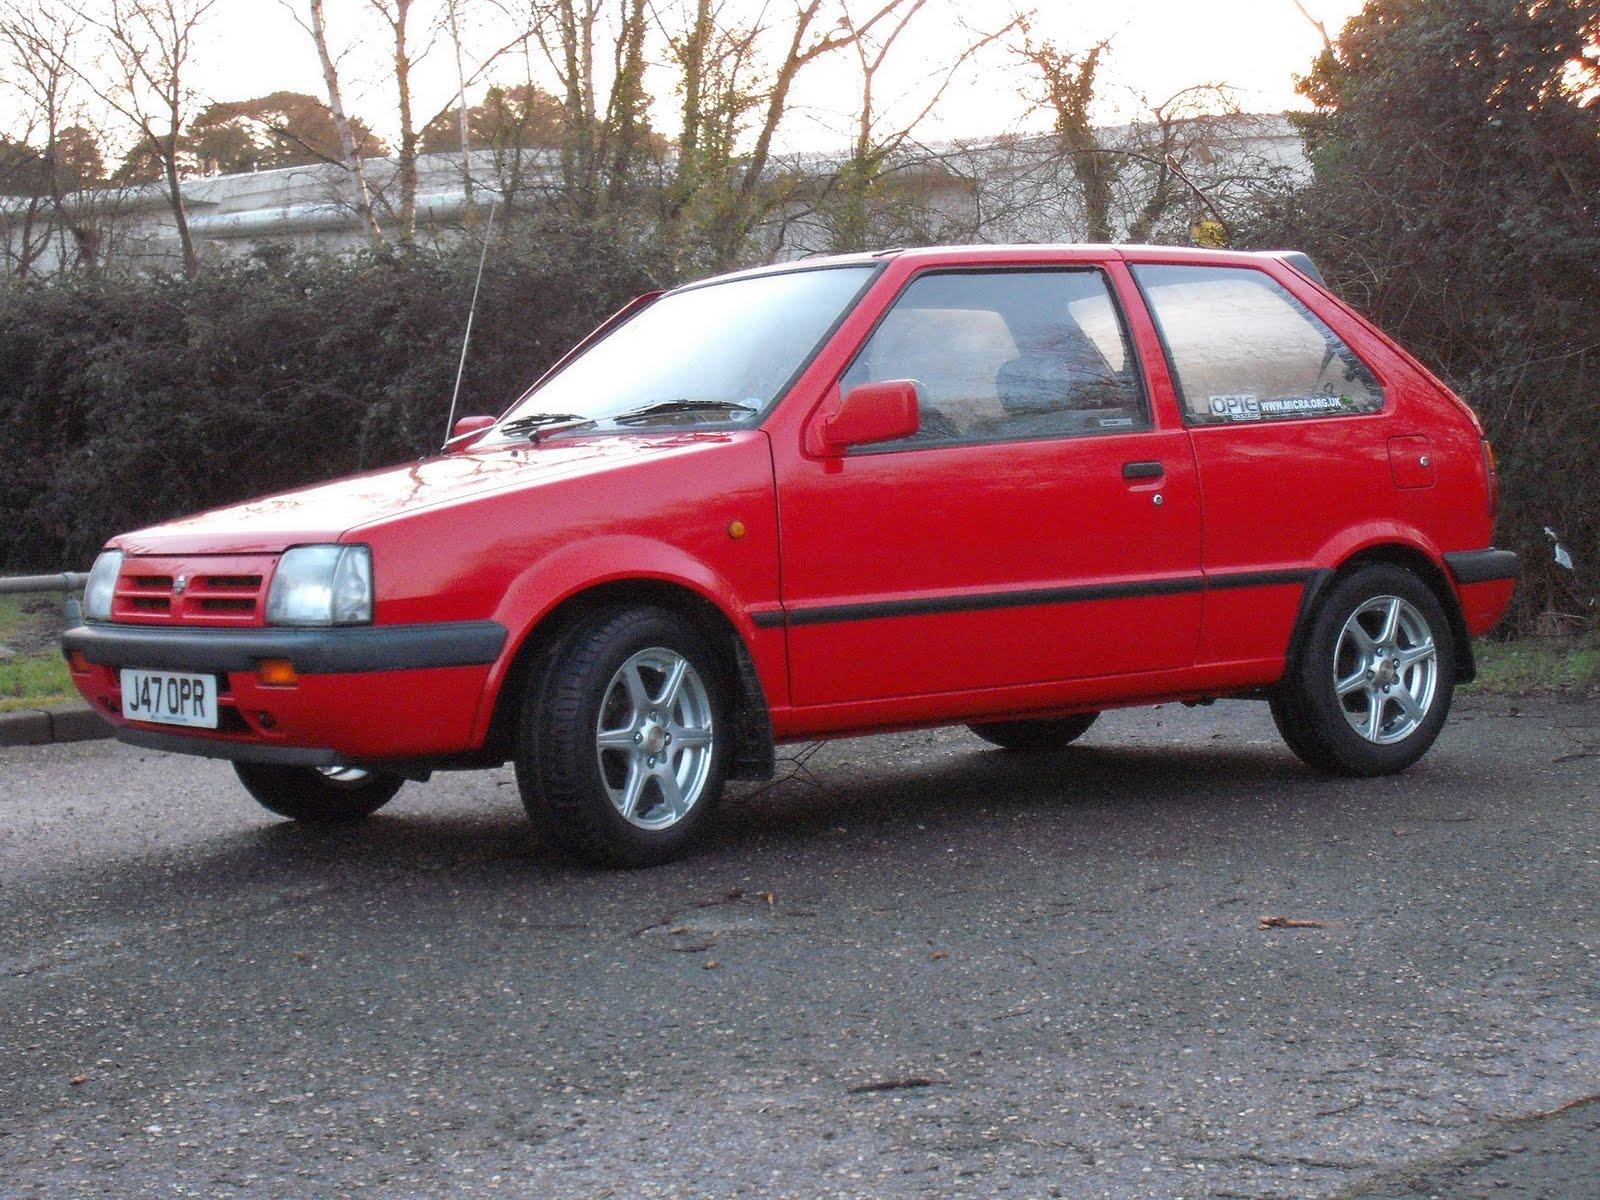 Micra-spot: Nissan Micra K10.....what else?